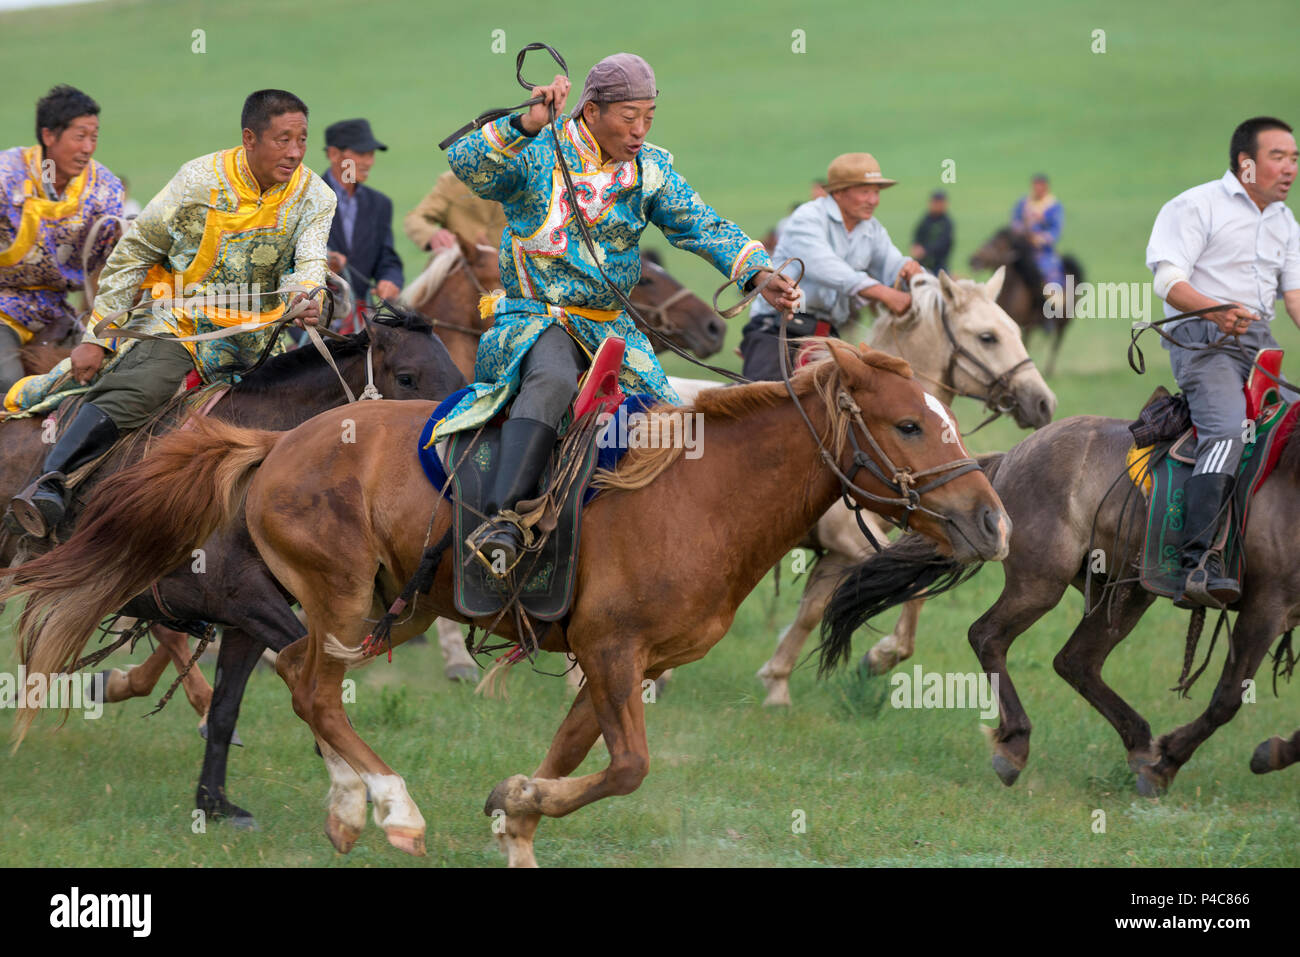 Young horsemen demonstrate team riding, Zhenglanqi Wuyi Farm, Inner Mongolia, China, Inner Mongolia, China - Stock Image